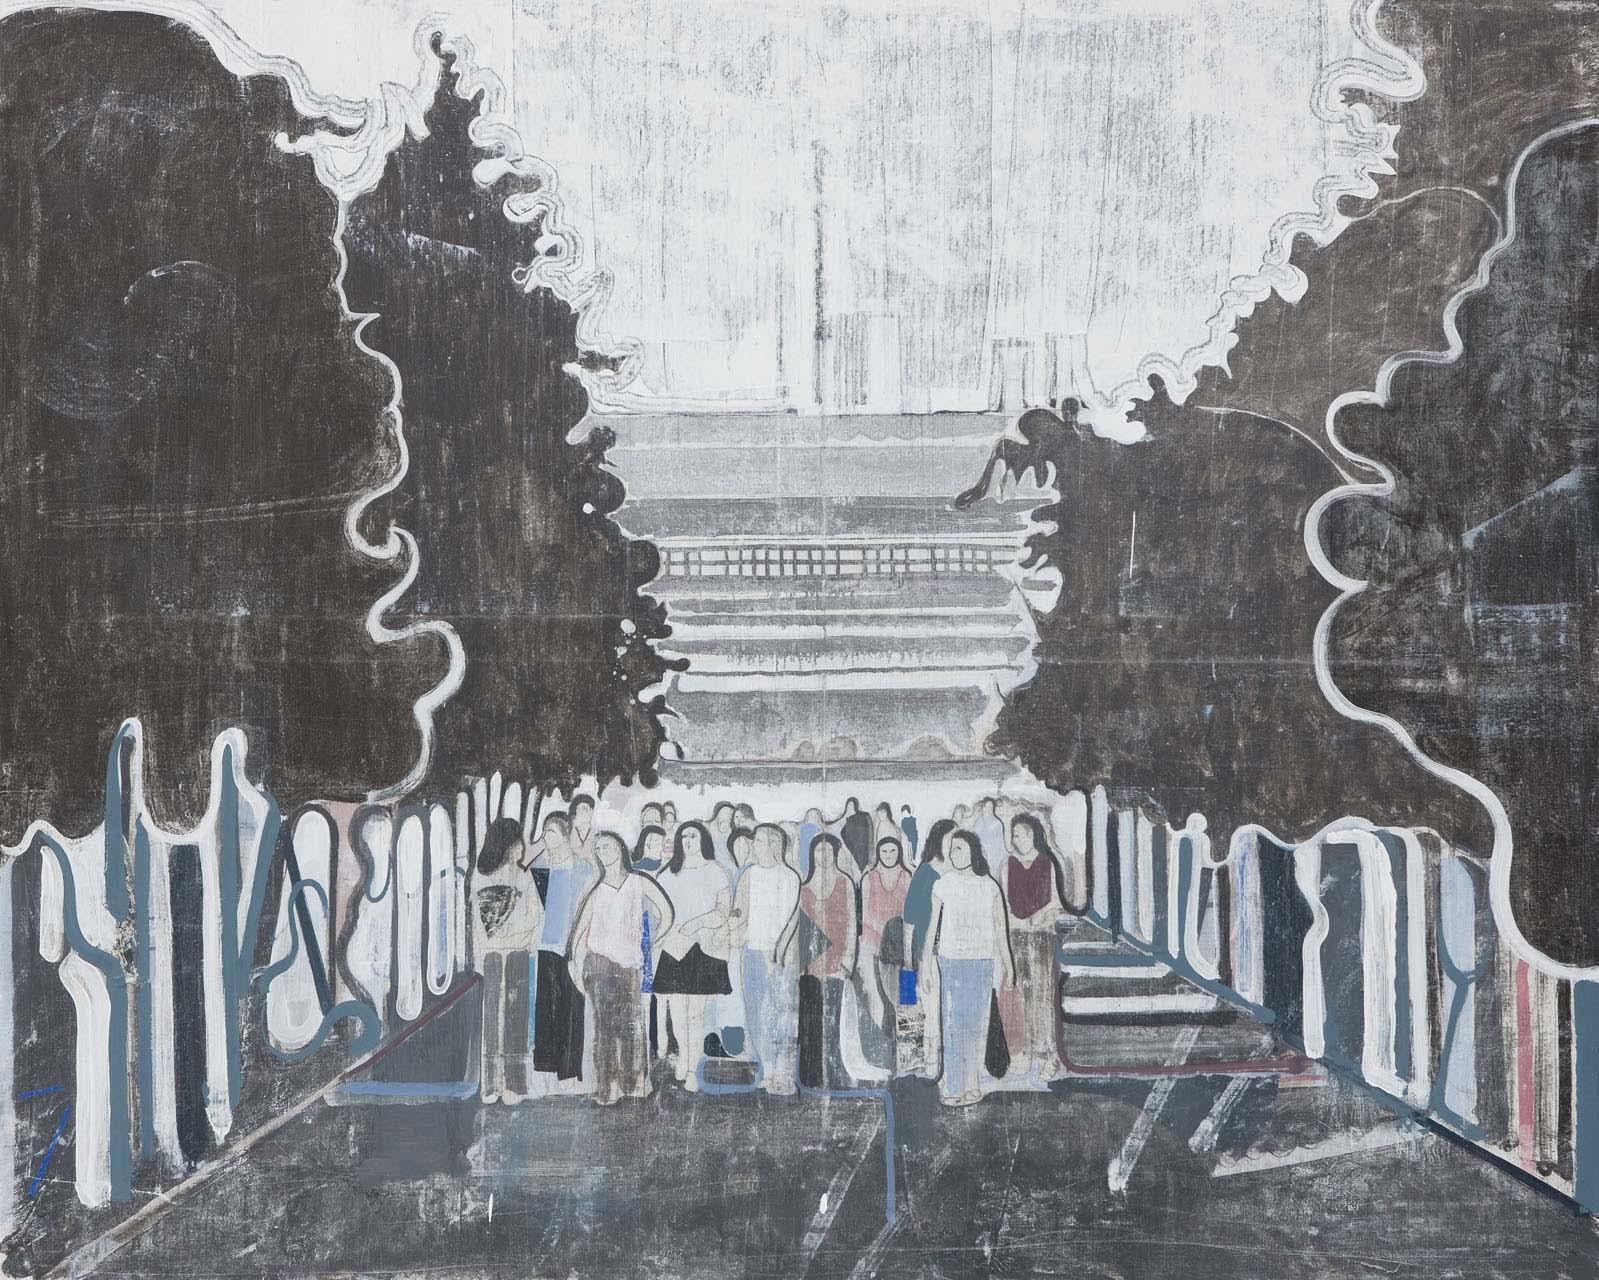 <p>Untitled (students under black trees),2008</p><p></p>